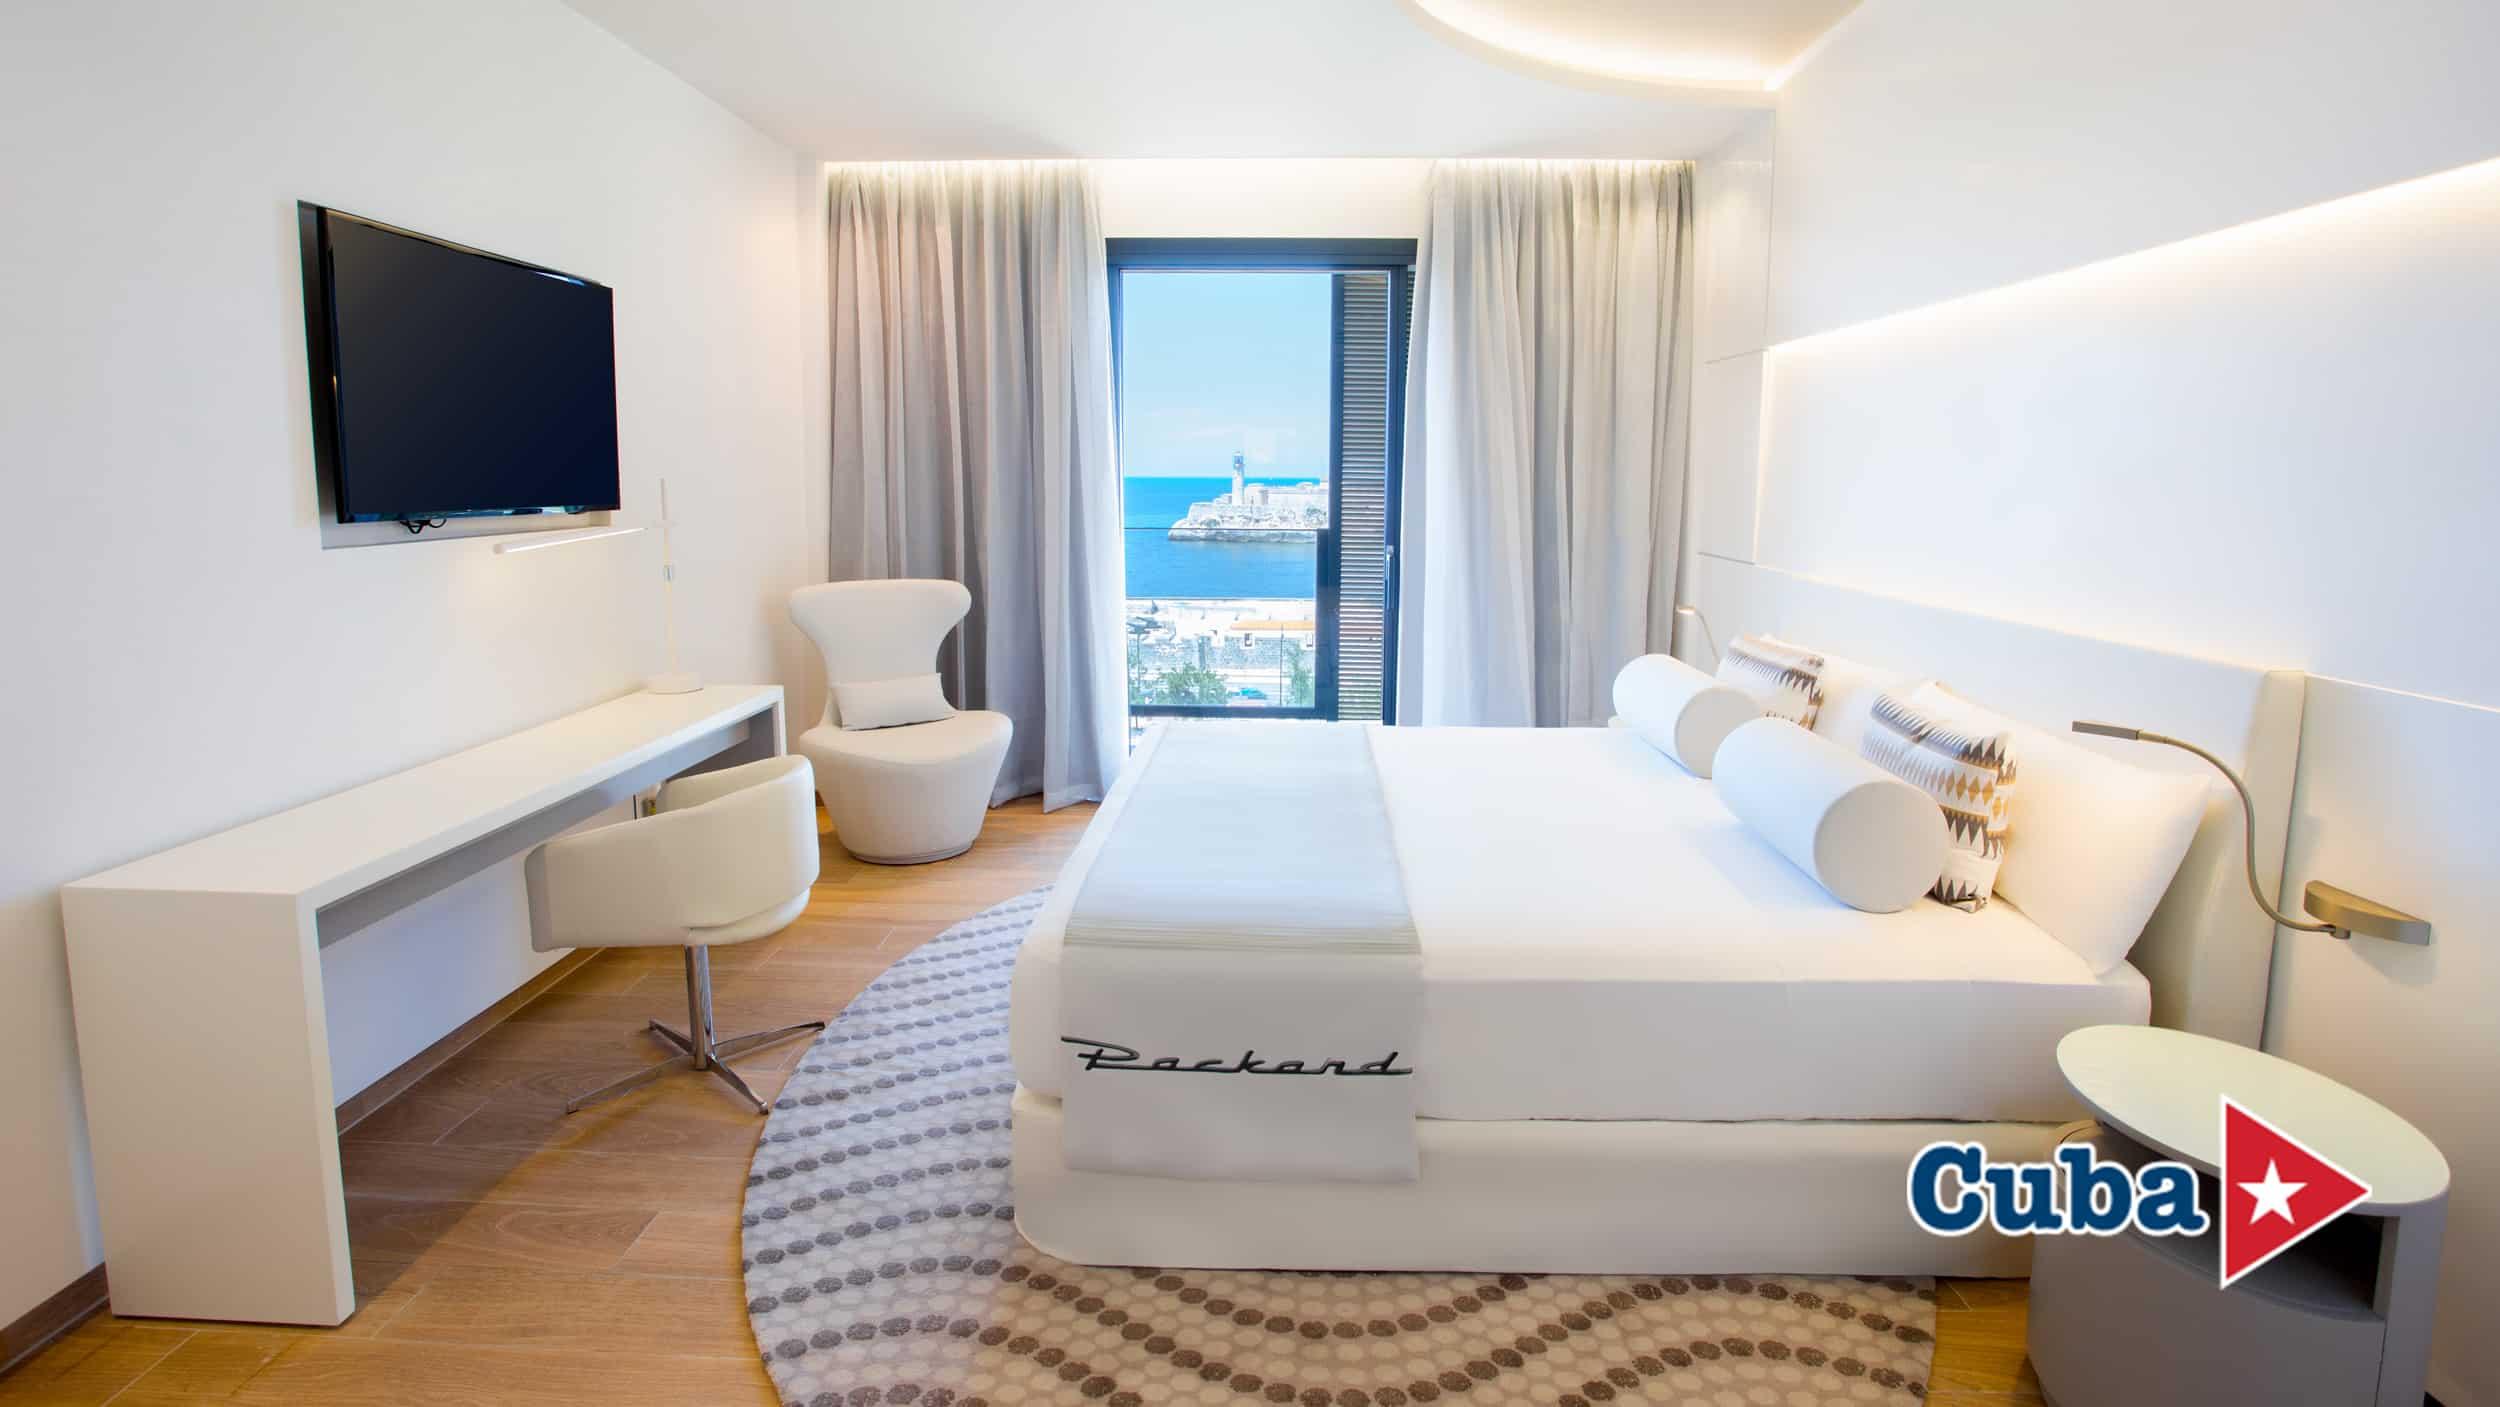 Iberostar Grand Packard Hotel | Standard Room